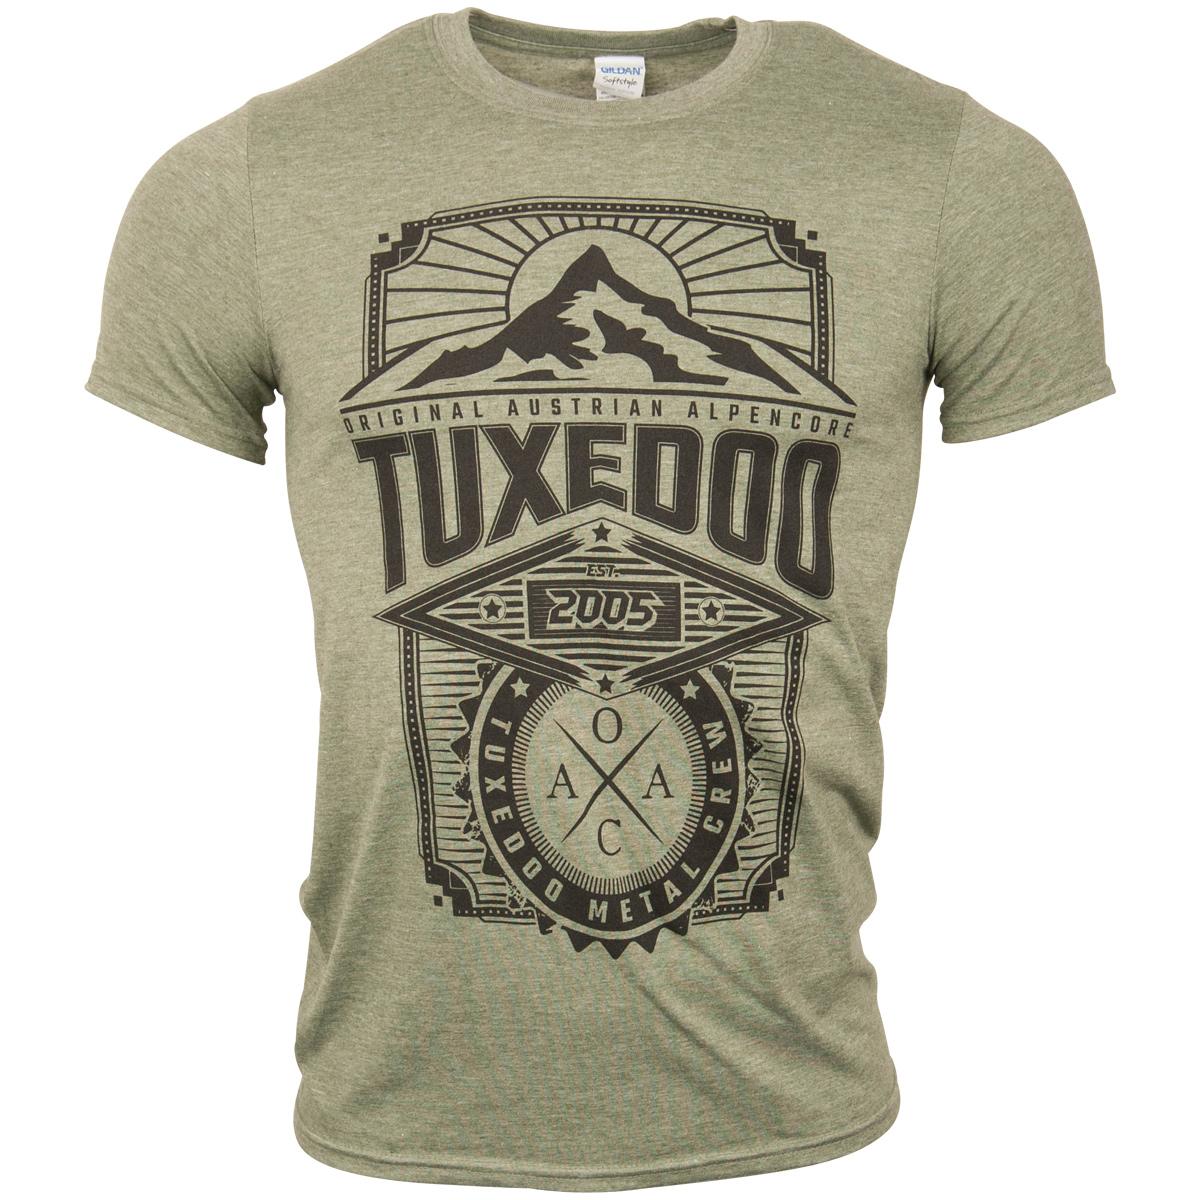 tuXedoo - T-Shirt Berg - grün